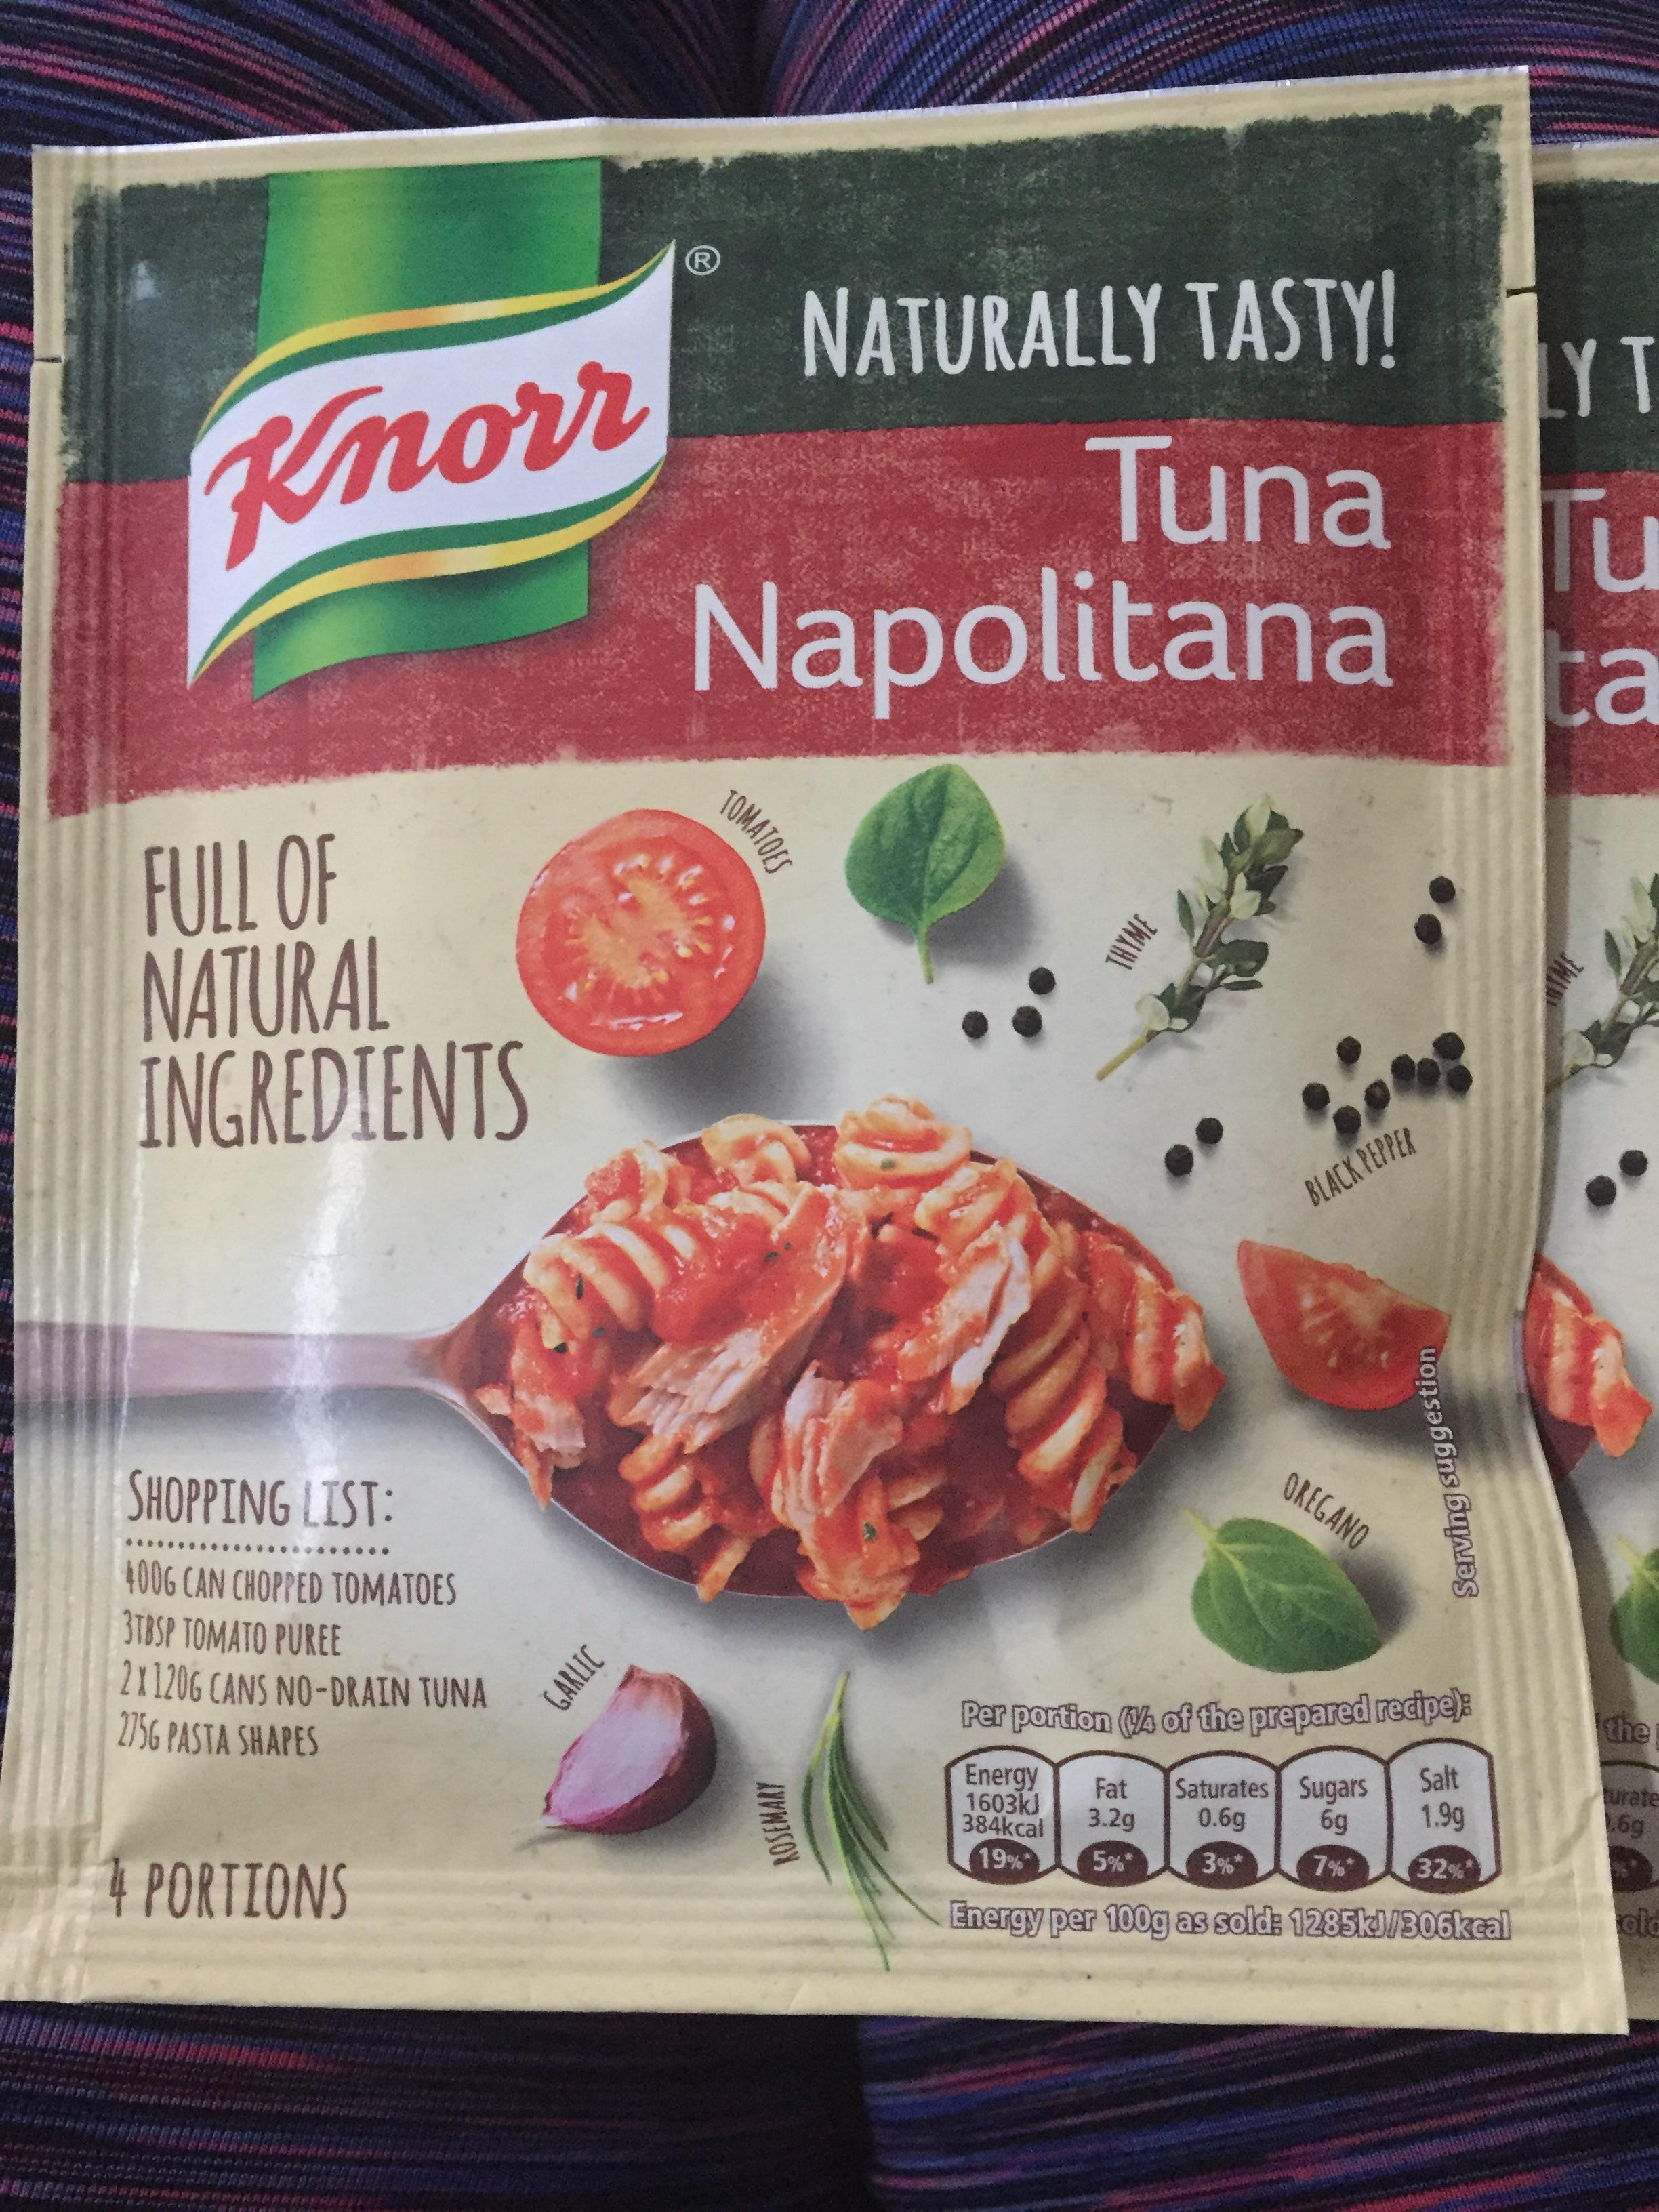 Knorr Tuna Napolitana pasta mix 10p @ b&m Naturally tasty